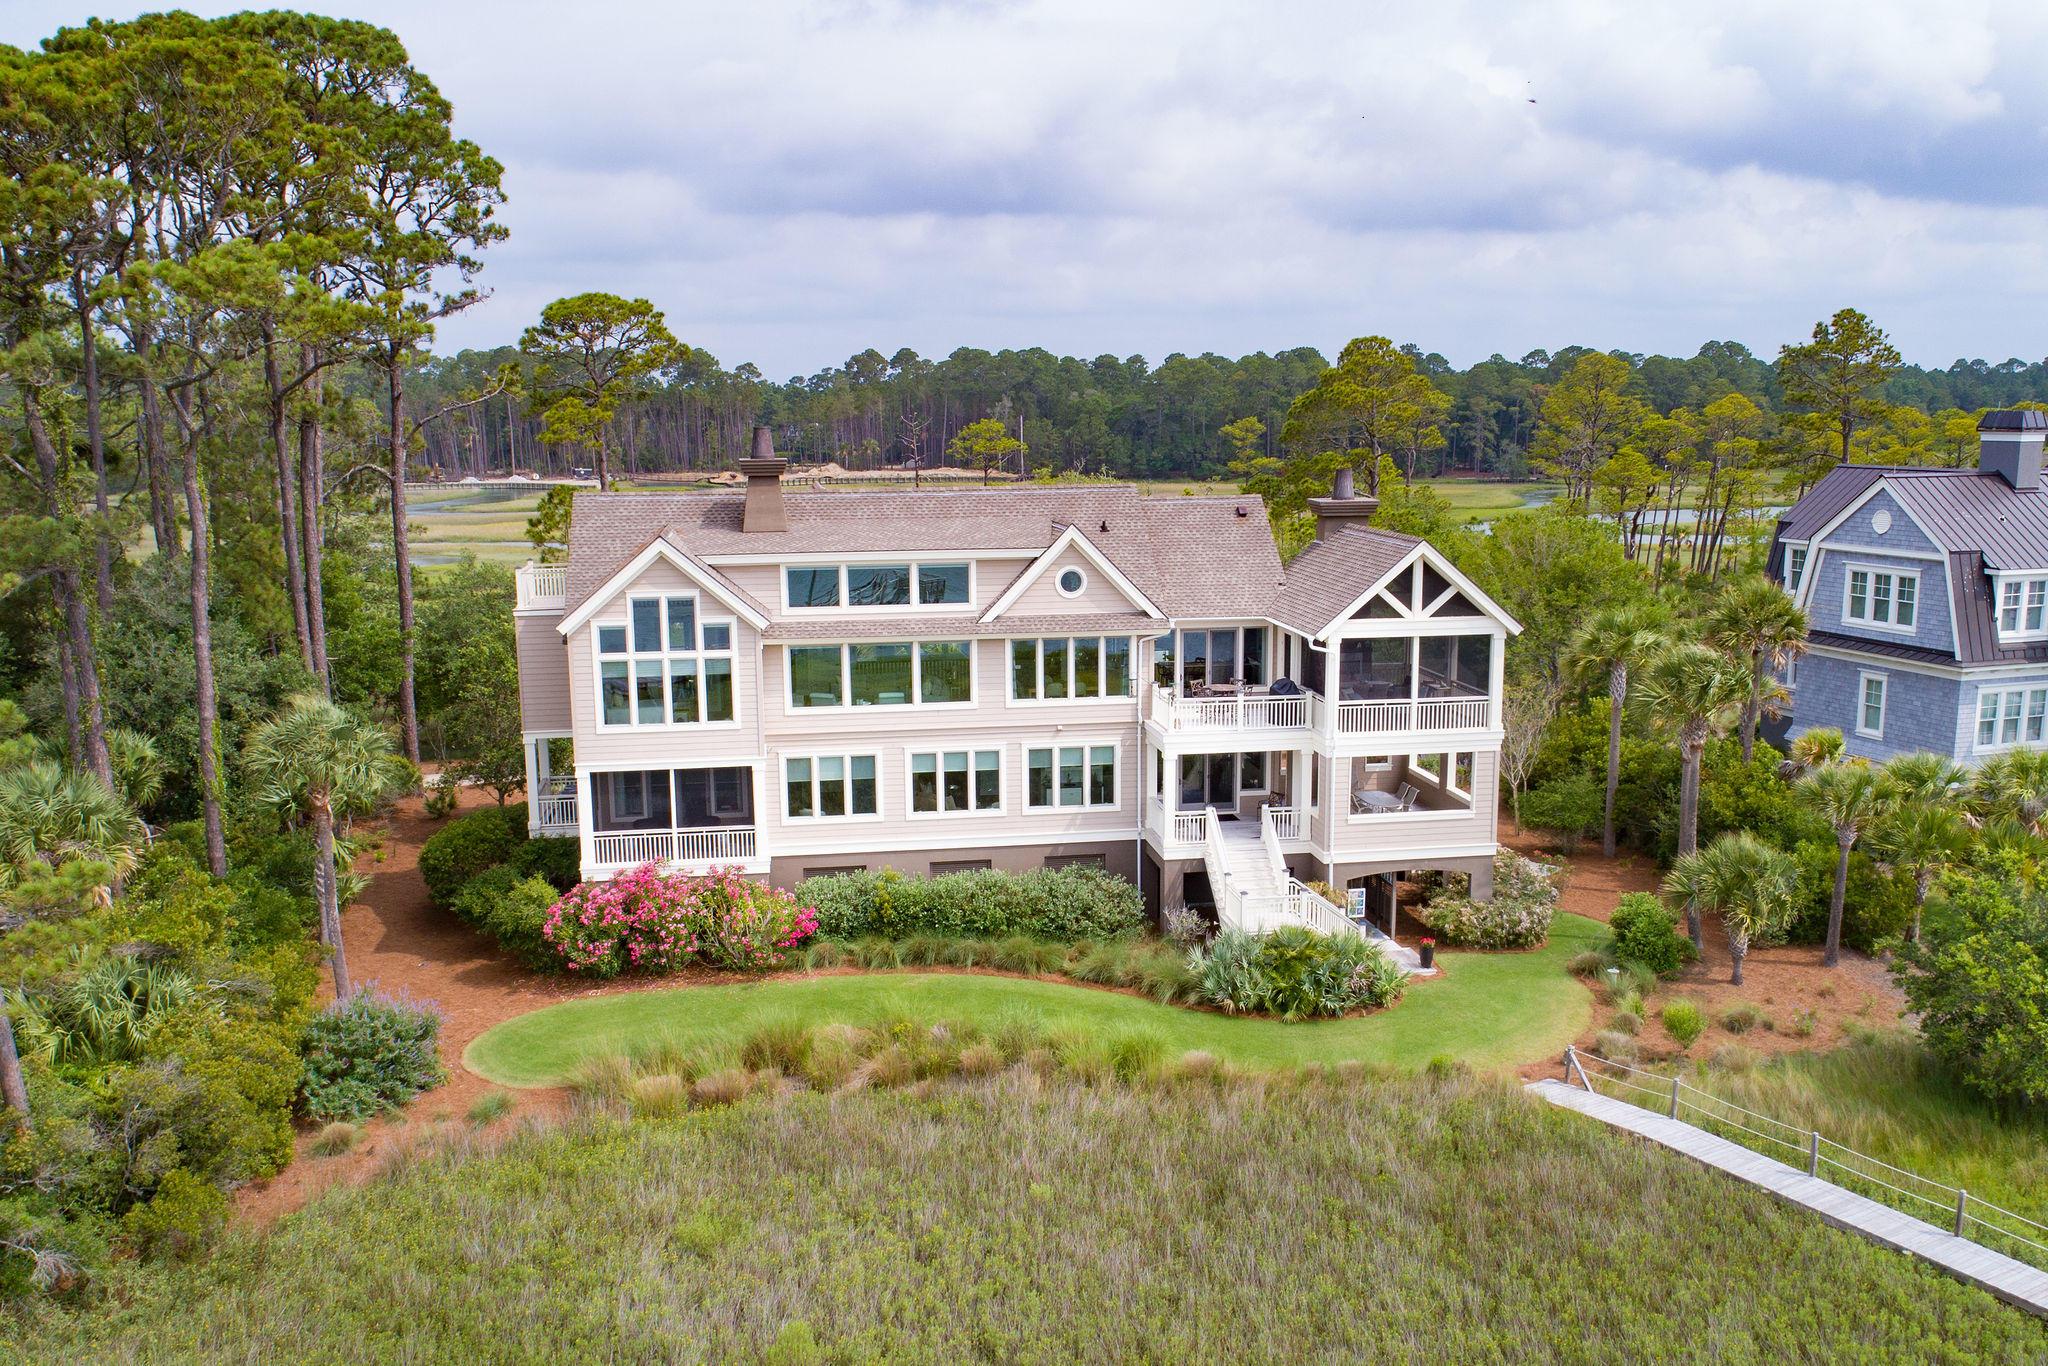 Seabrook Island Homes For Sale - 3135 Marshgate, Seabrook Island, SC - 10